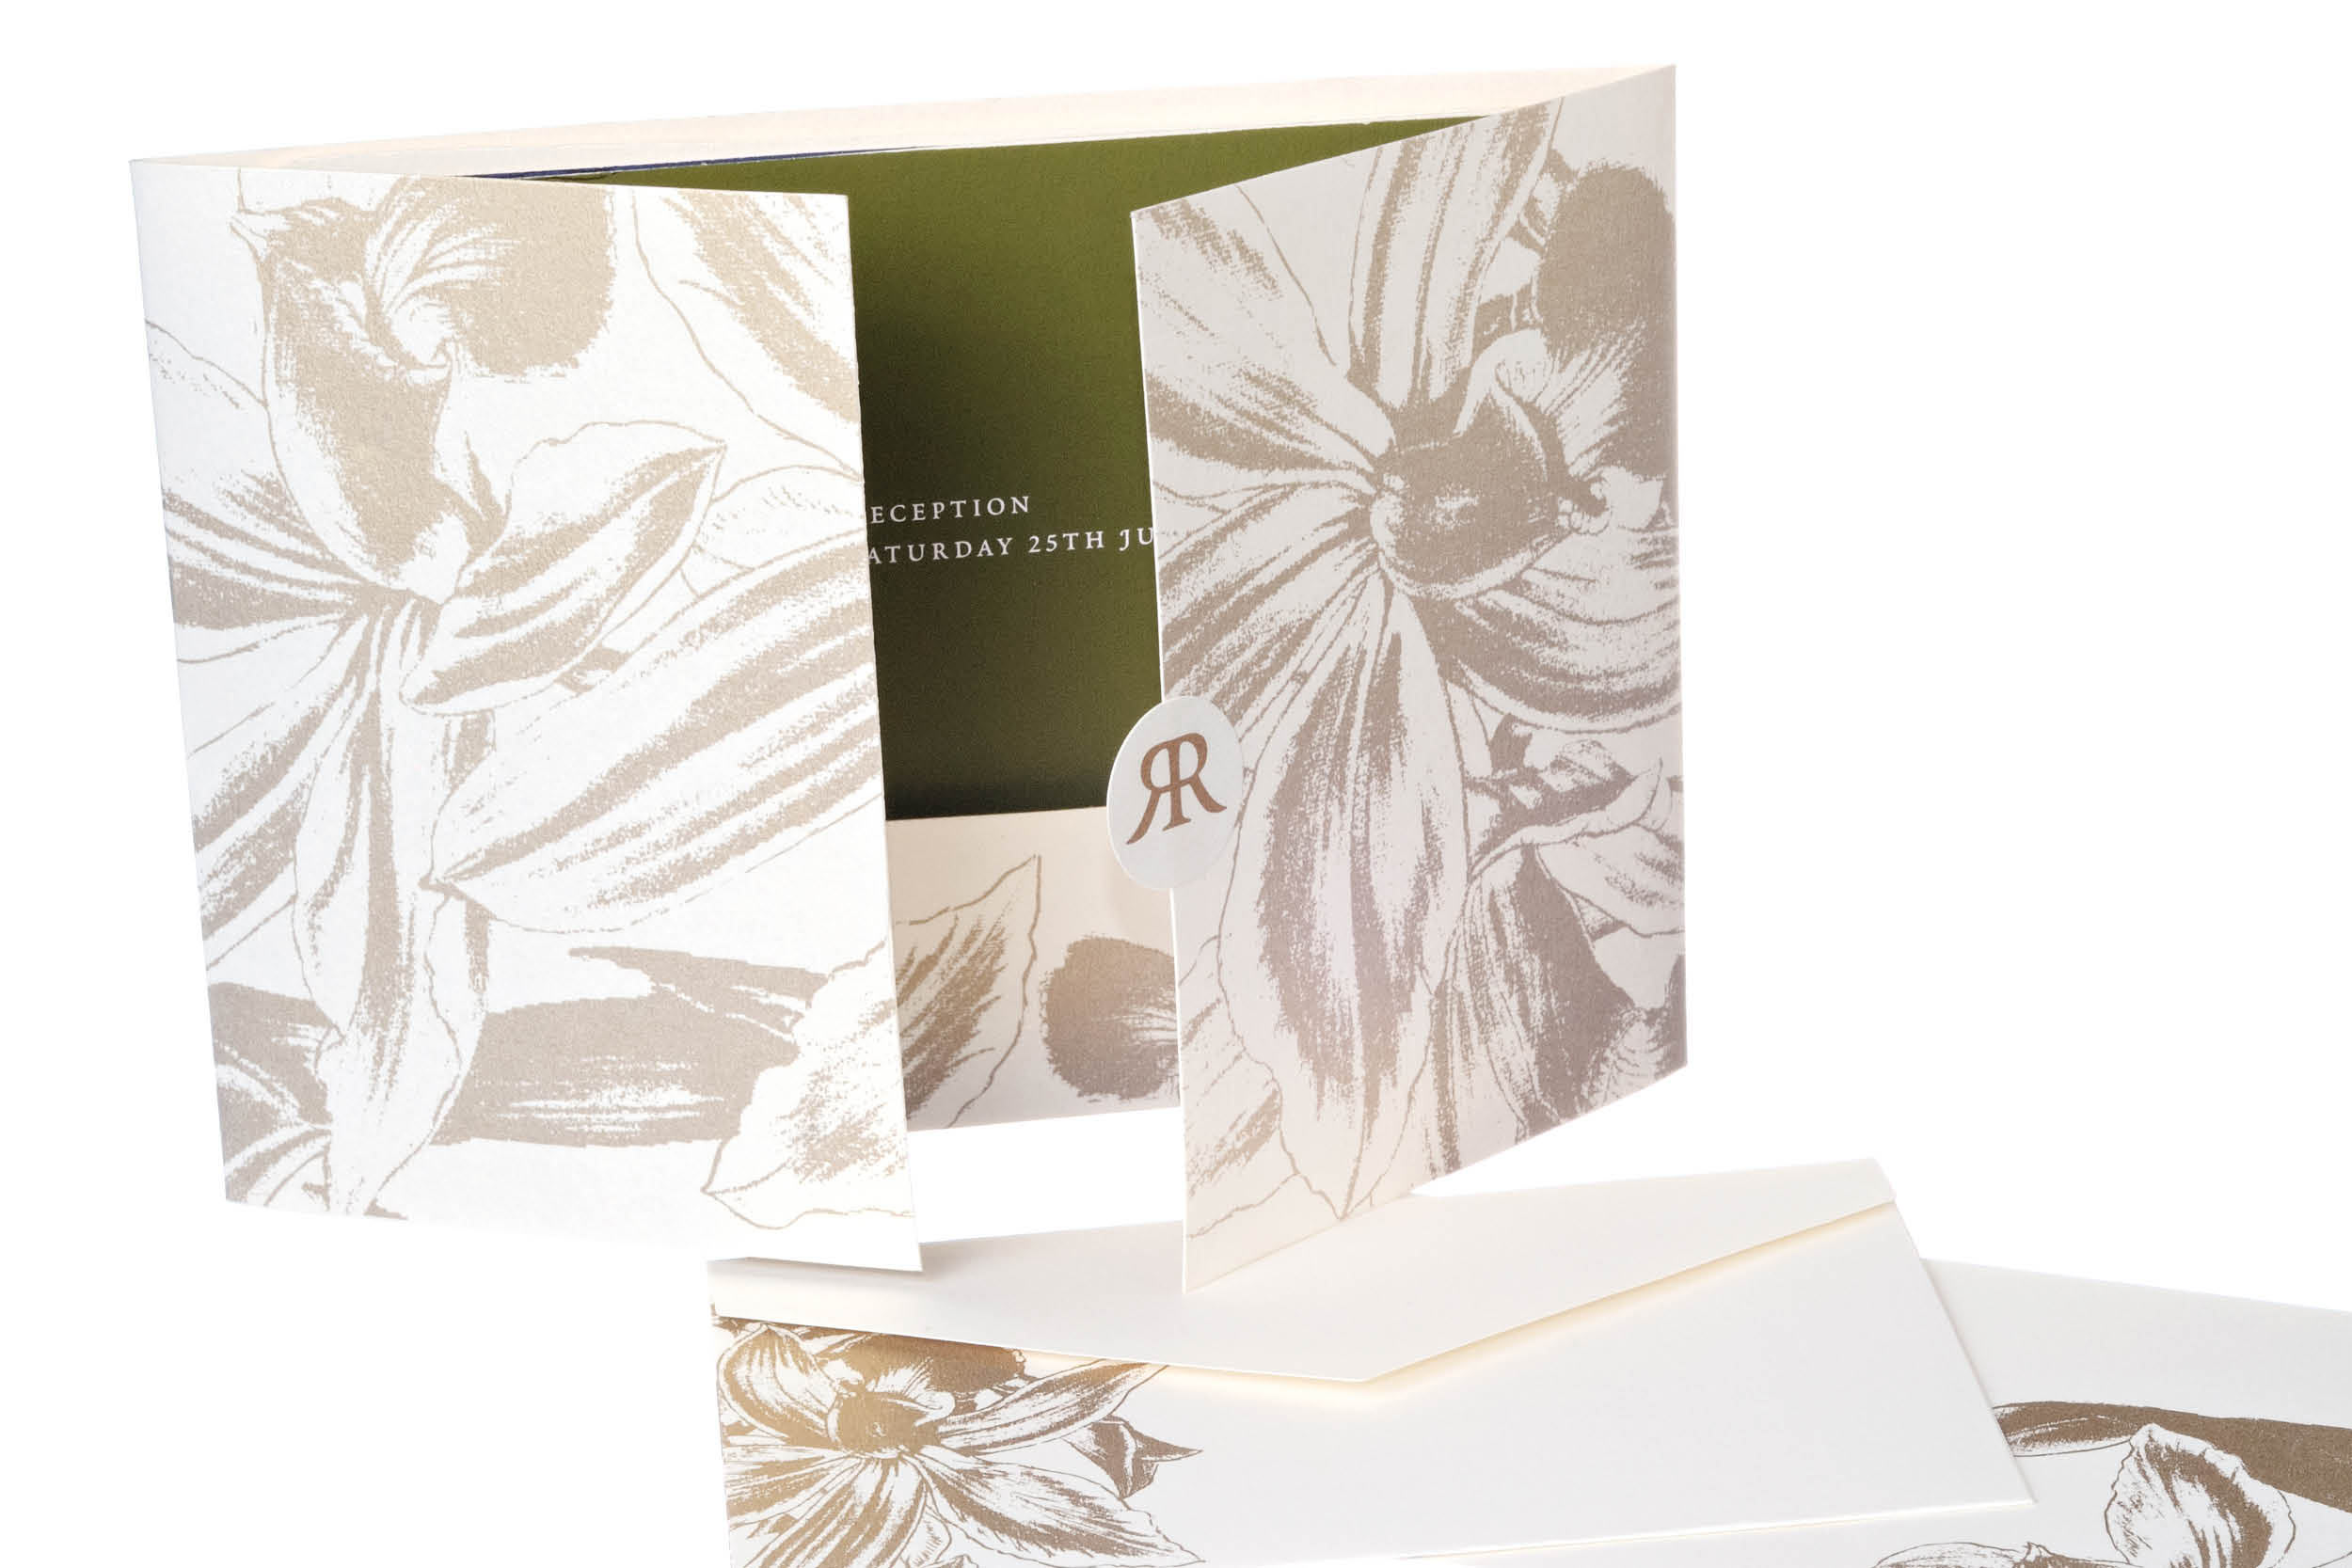 Orchid_wedding invitation_bespoke_ananyacards.com.jpg